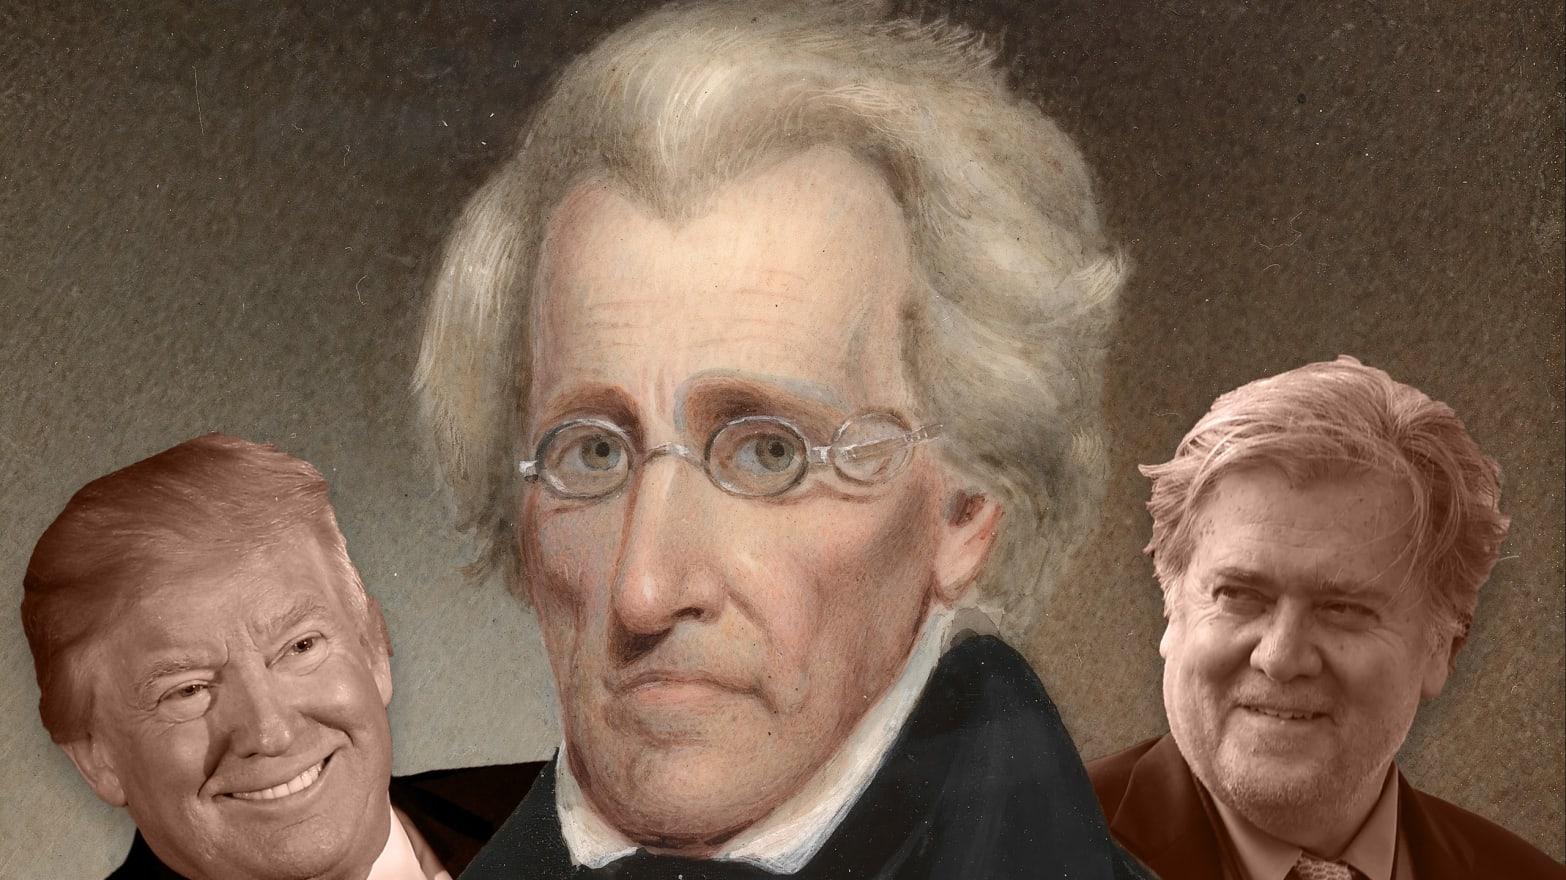 Steve Bannon Pushed Trump To Go Full Andrew Jackson